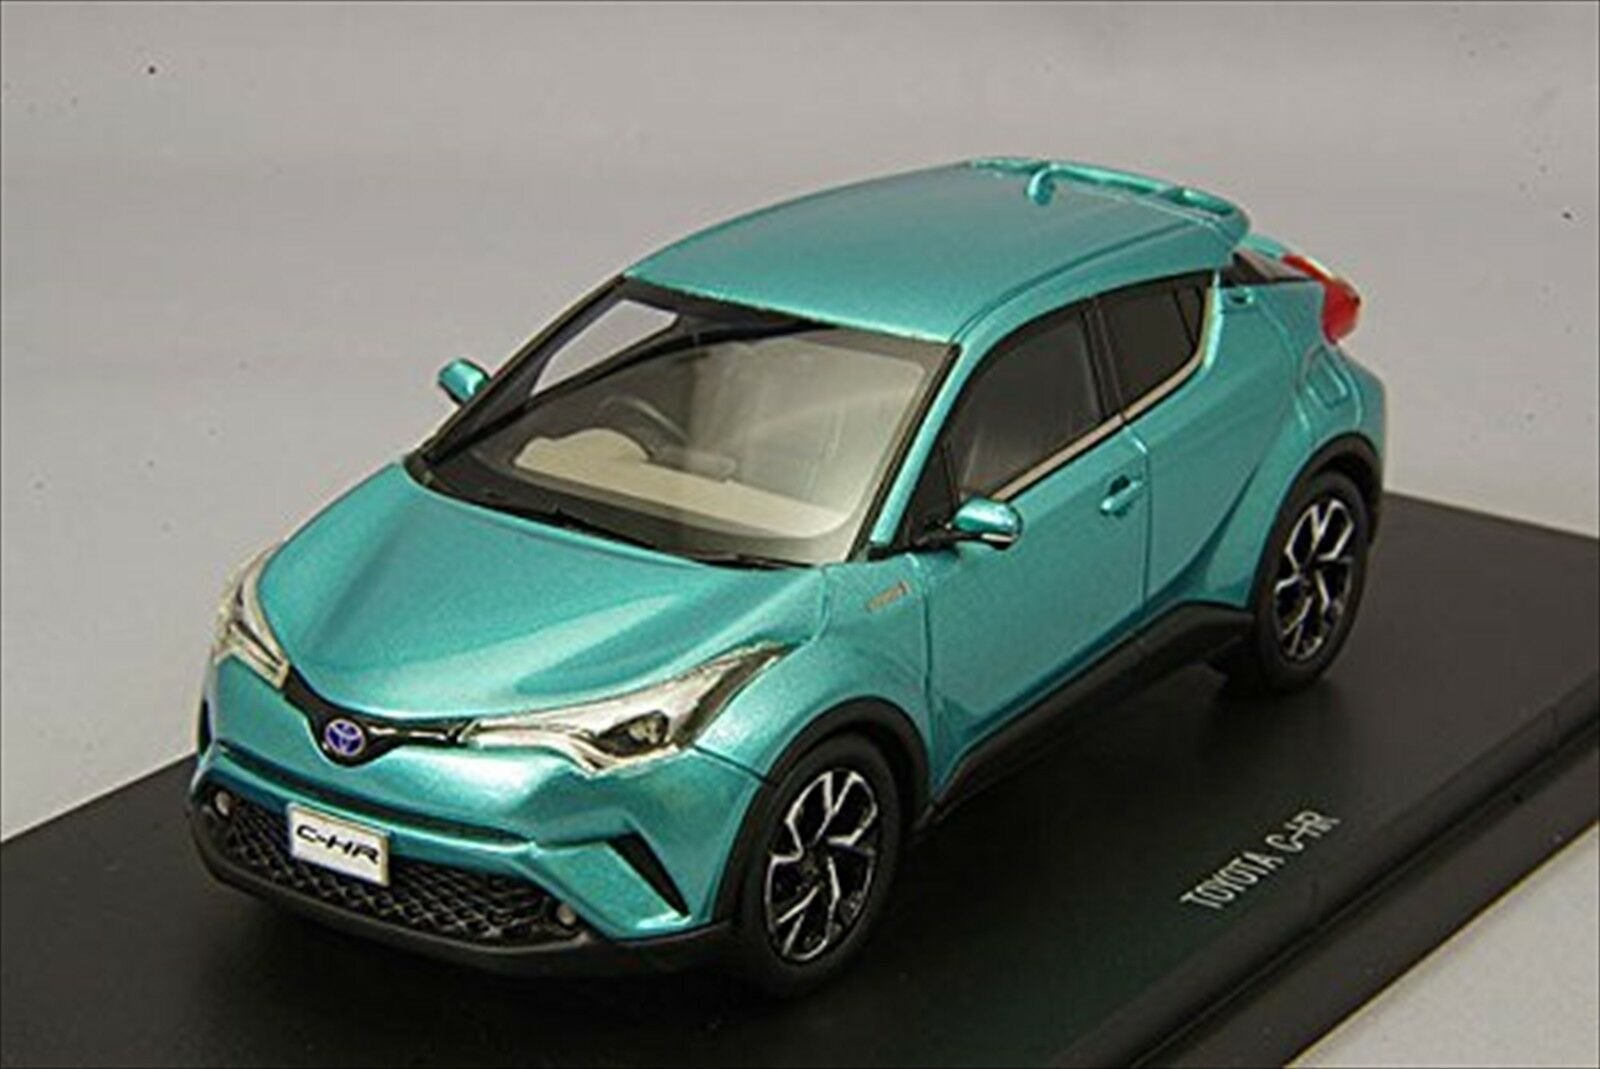 Ebbro 1/43 Toyota C-hr radiante verde metálico Resina Modelo 45602 Nuevo